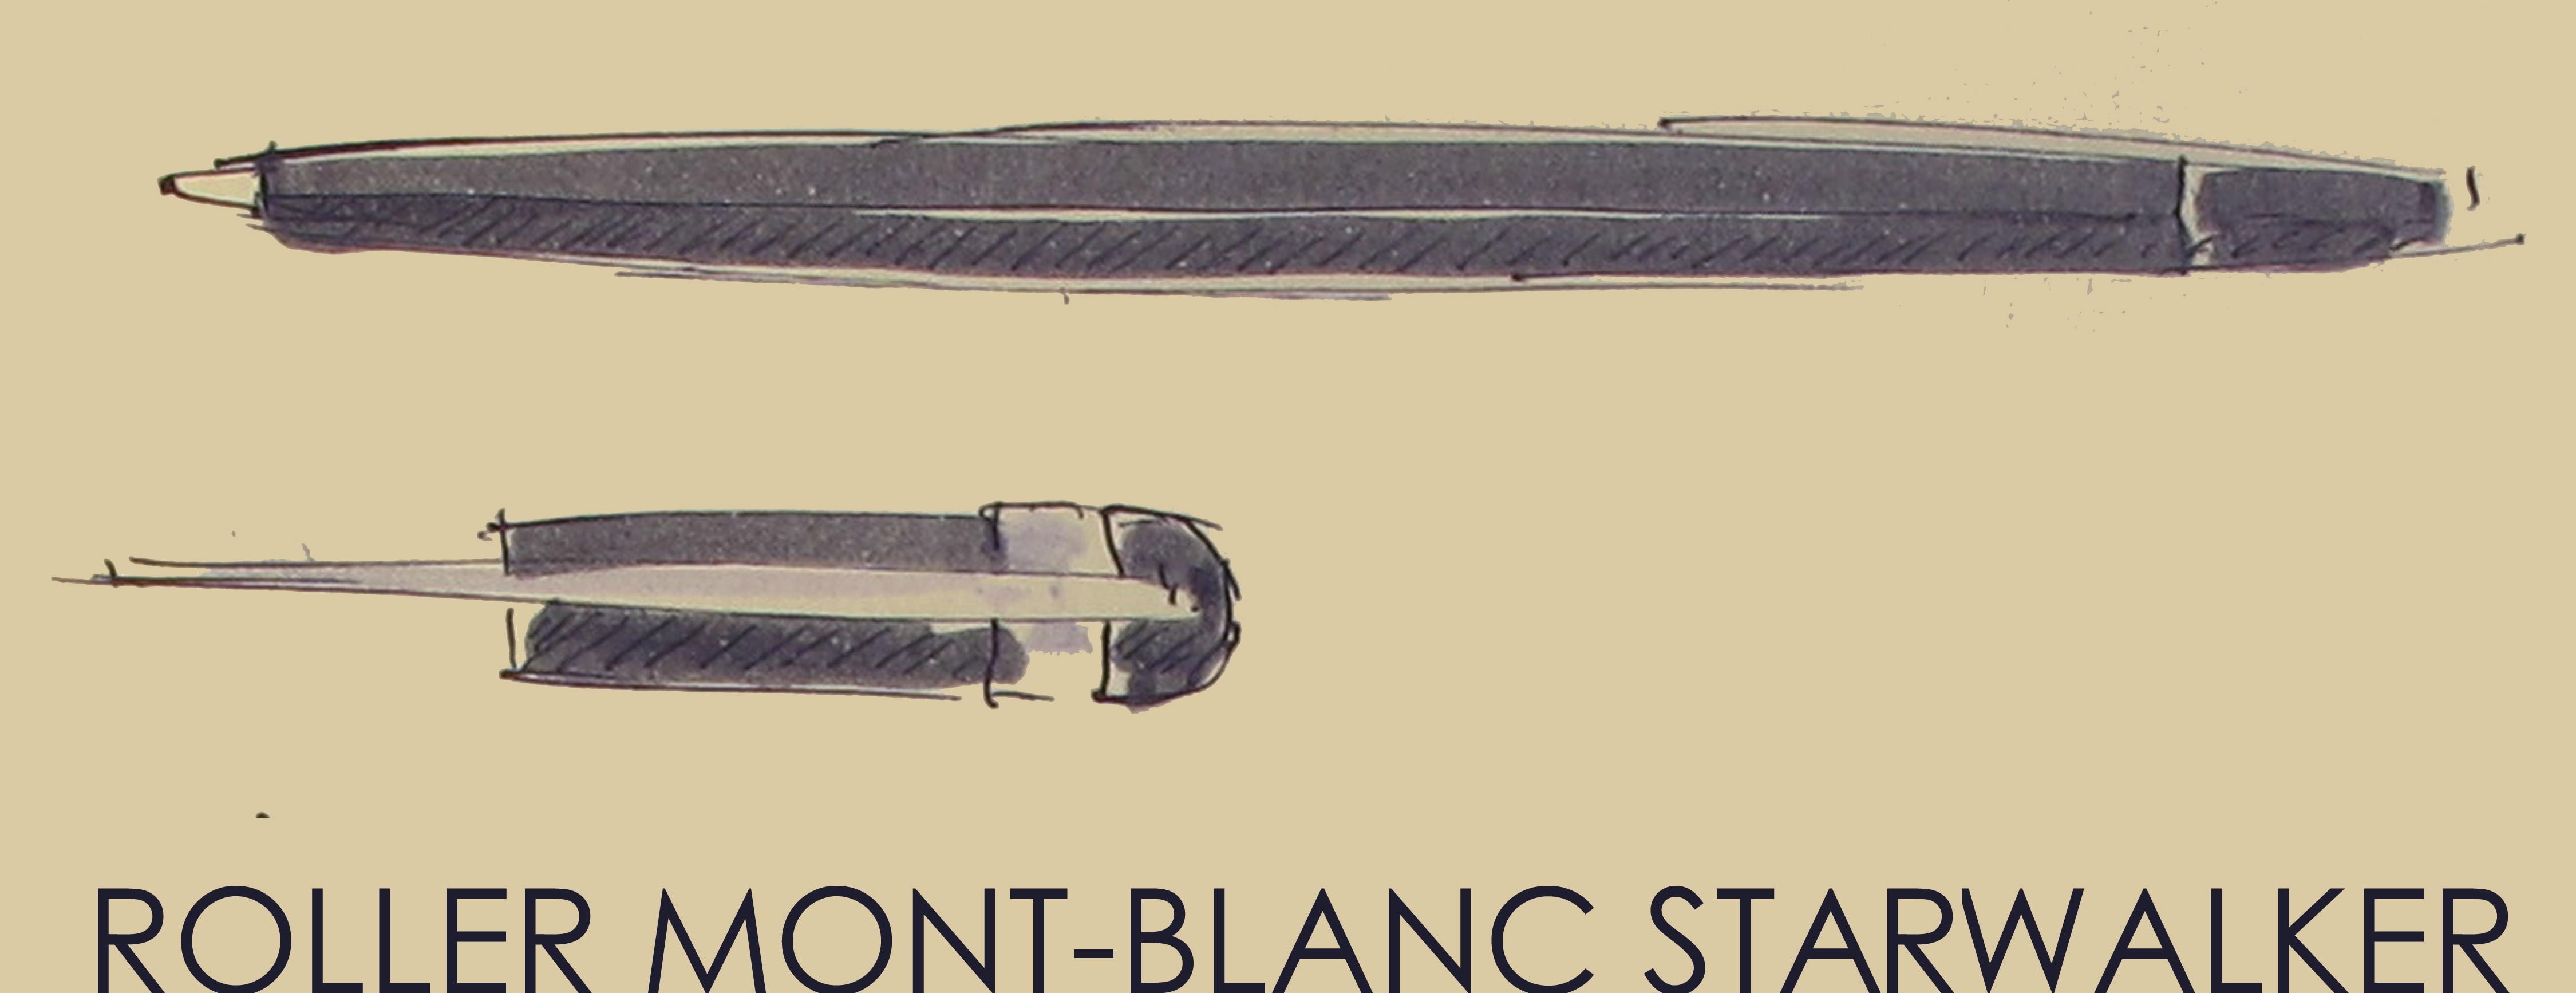 stylos plumes mont blanc. Black Bedroom Furniture Sets. Home Design Ideas